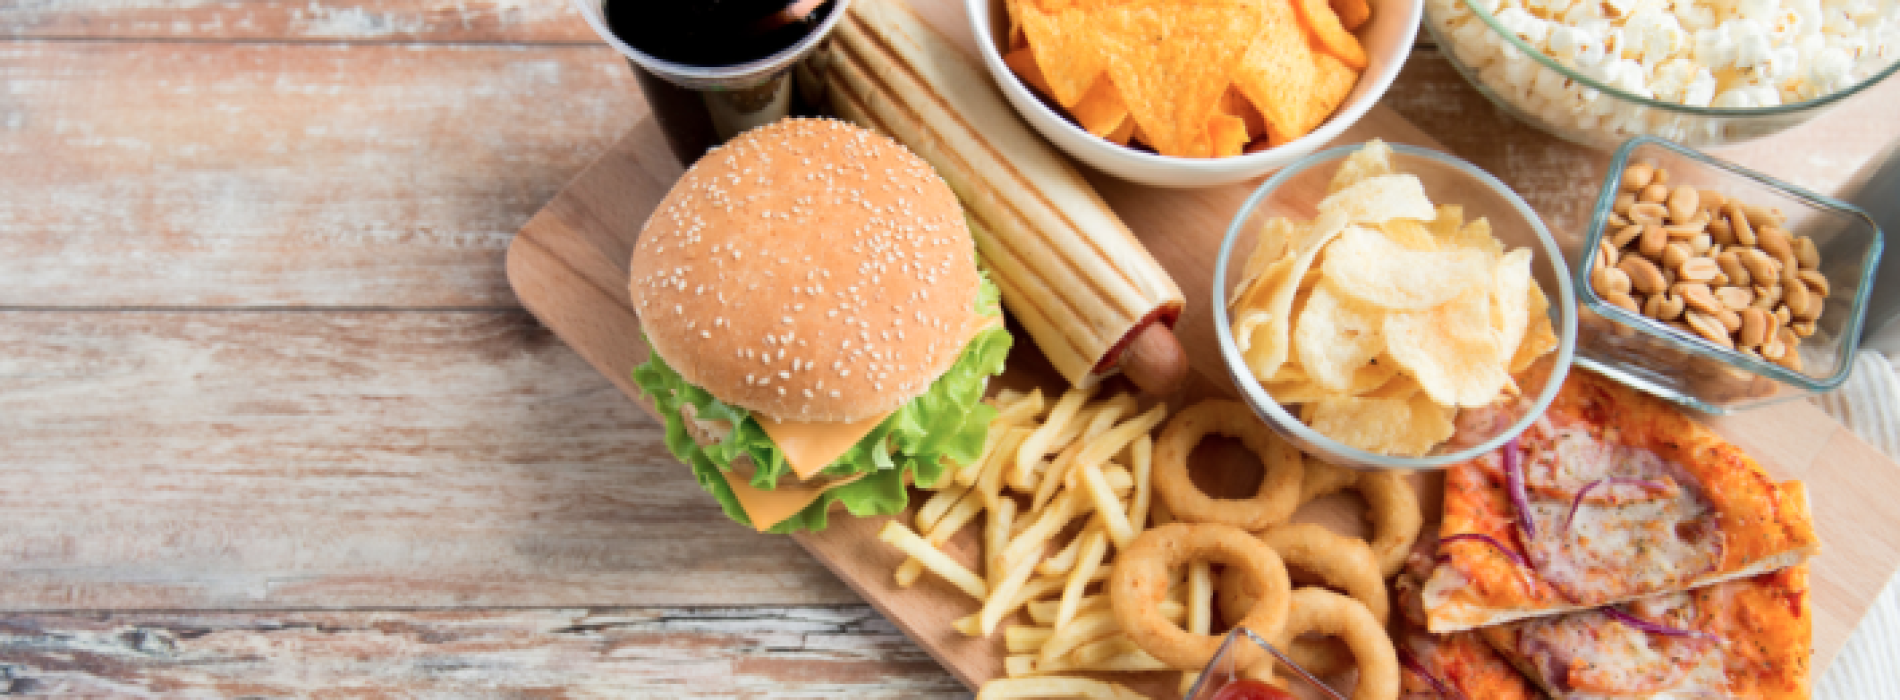 Stop junk food! L'allarme viene dall'Università Luigi Vanvitelli